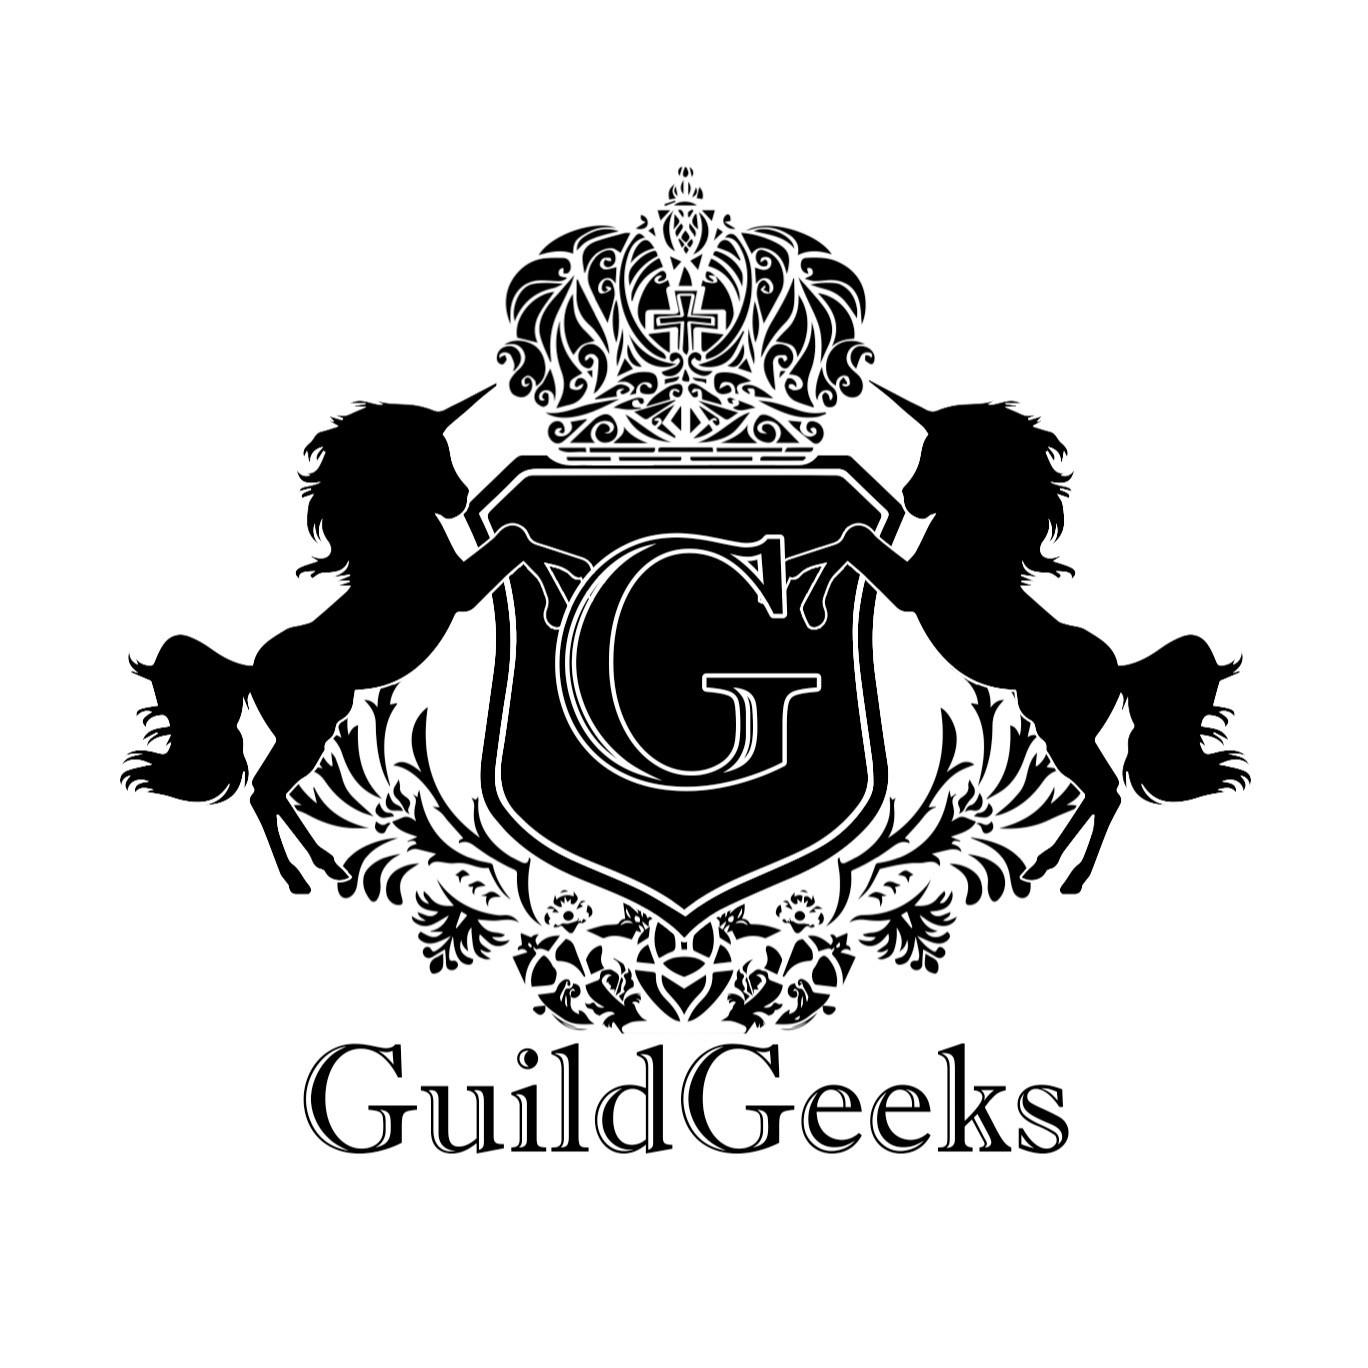 Guild Geeks